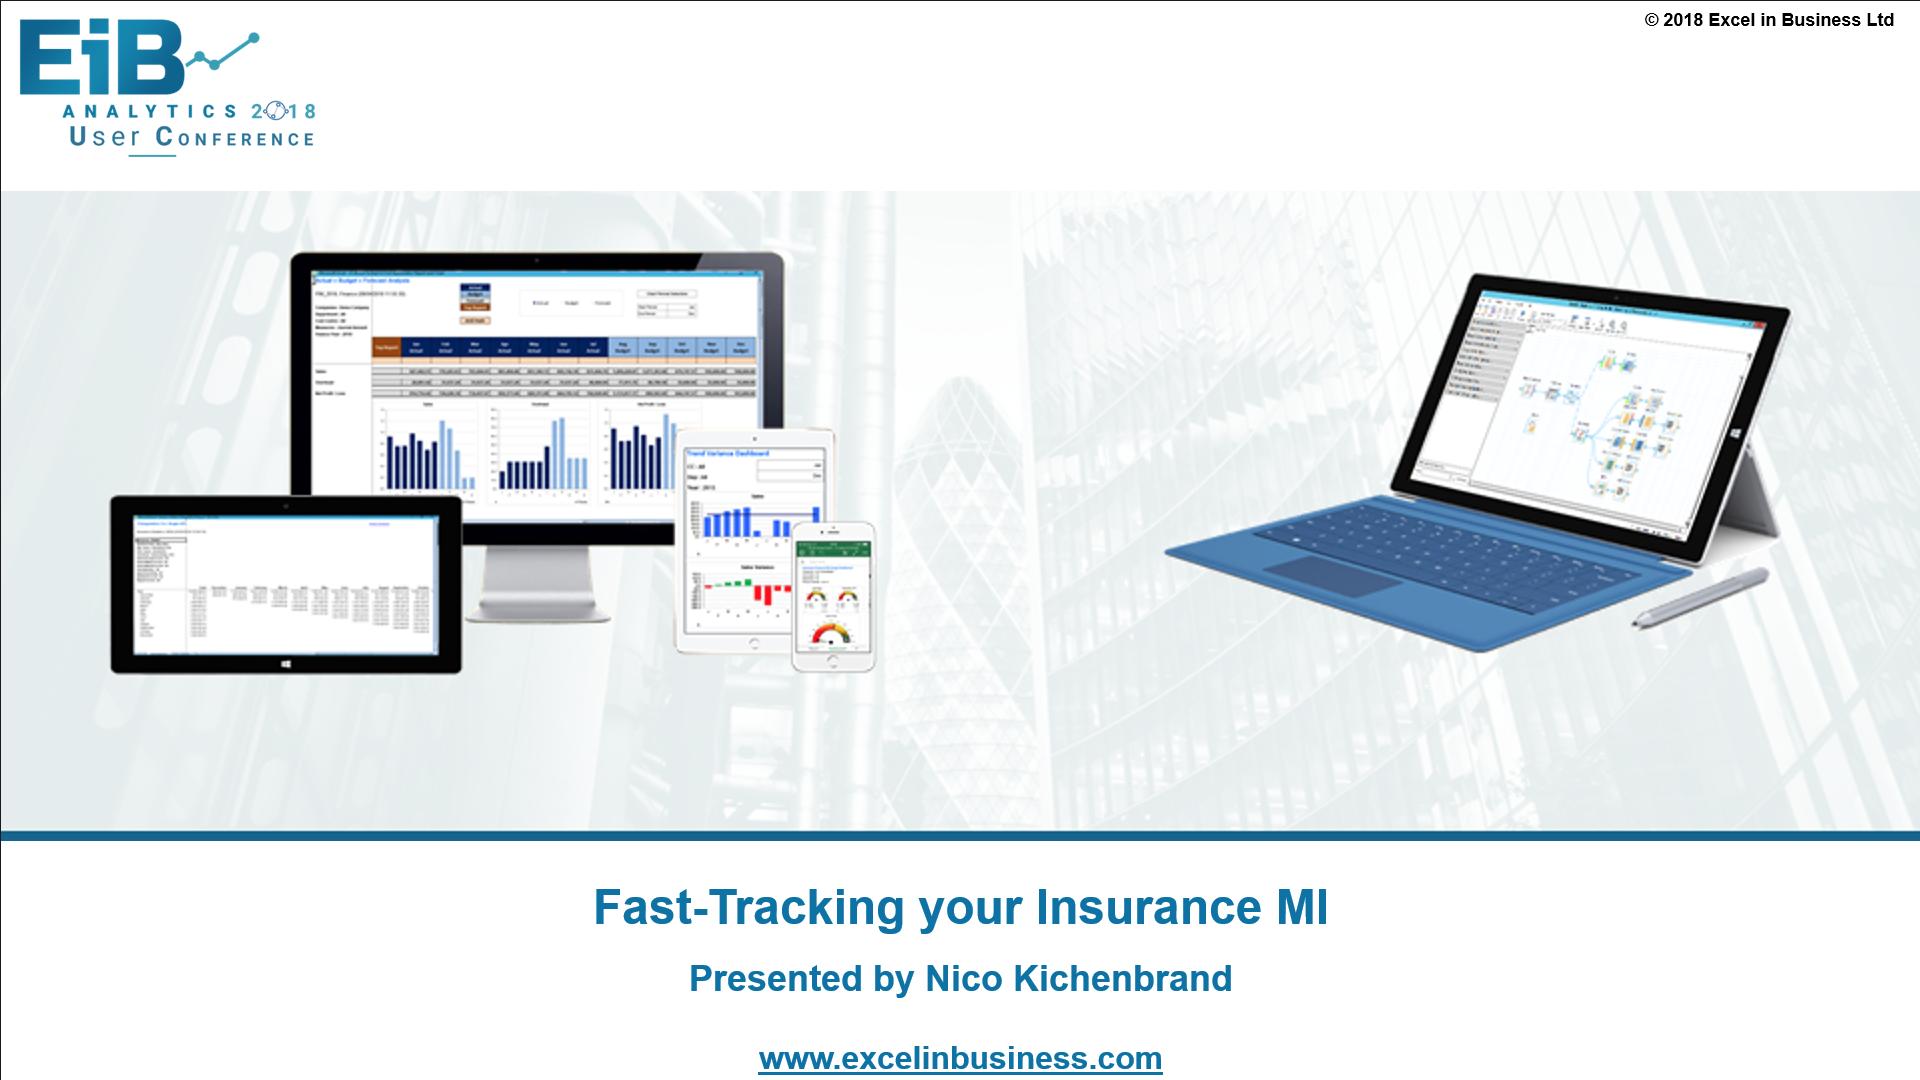 4.6 - Insurance Stream - Fast-Tracking your Insurance MI - Nico Kichenbrand